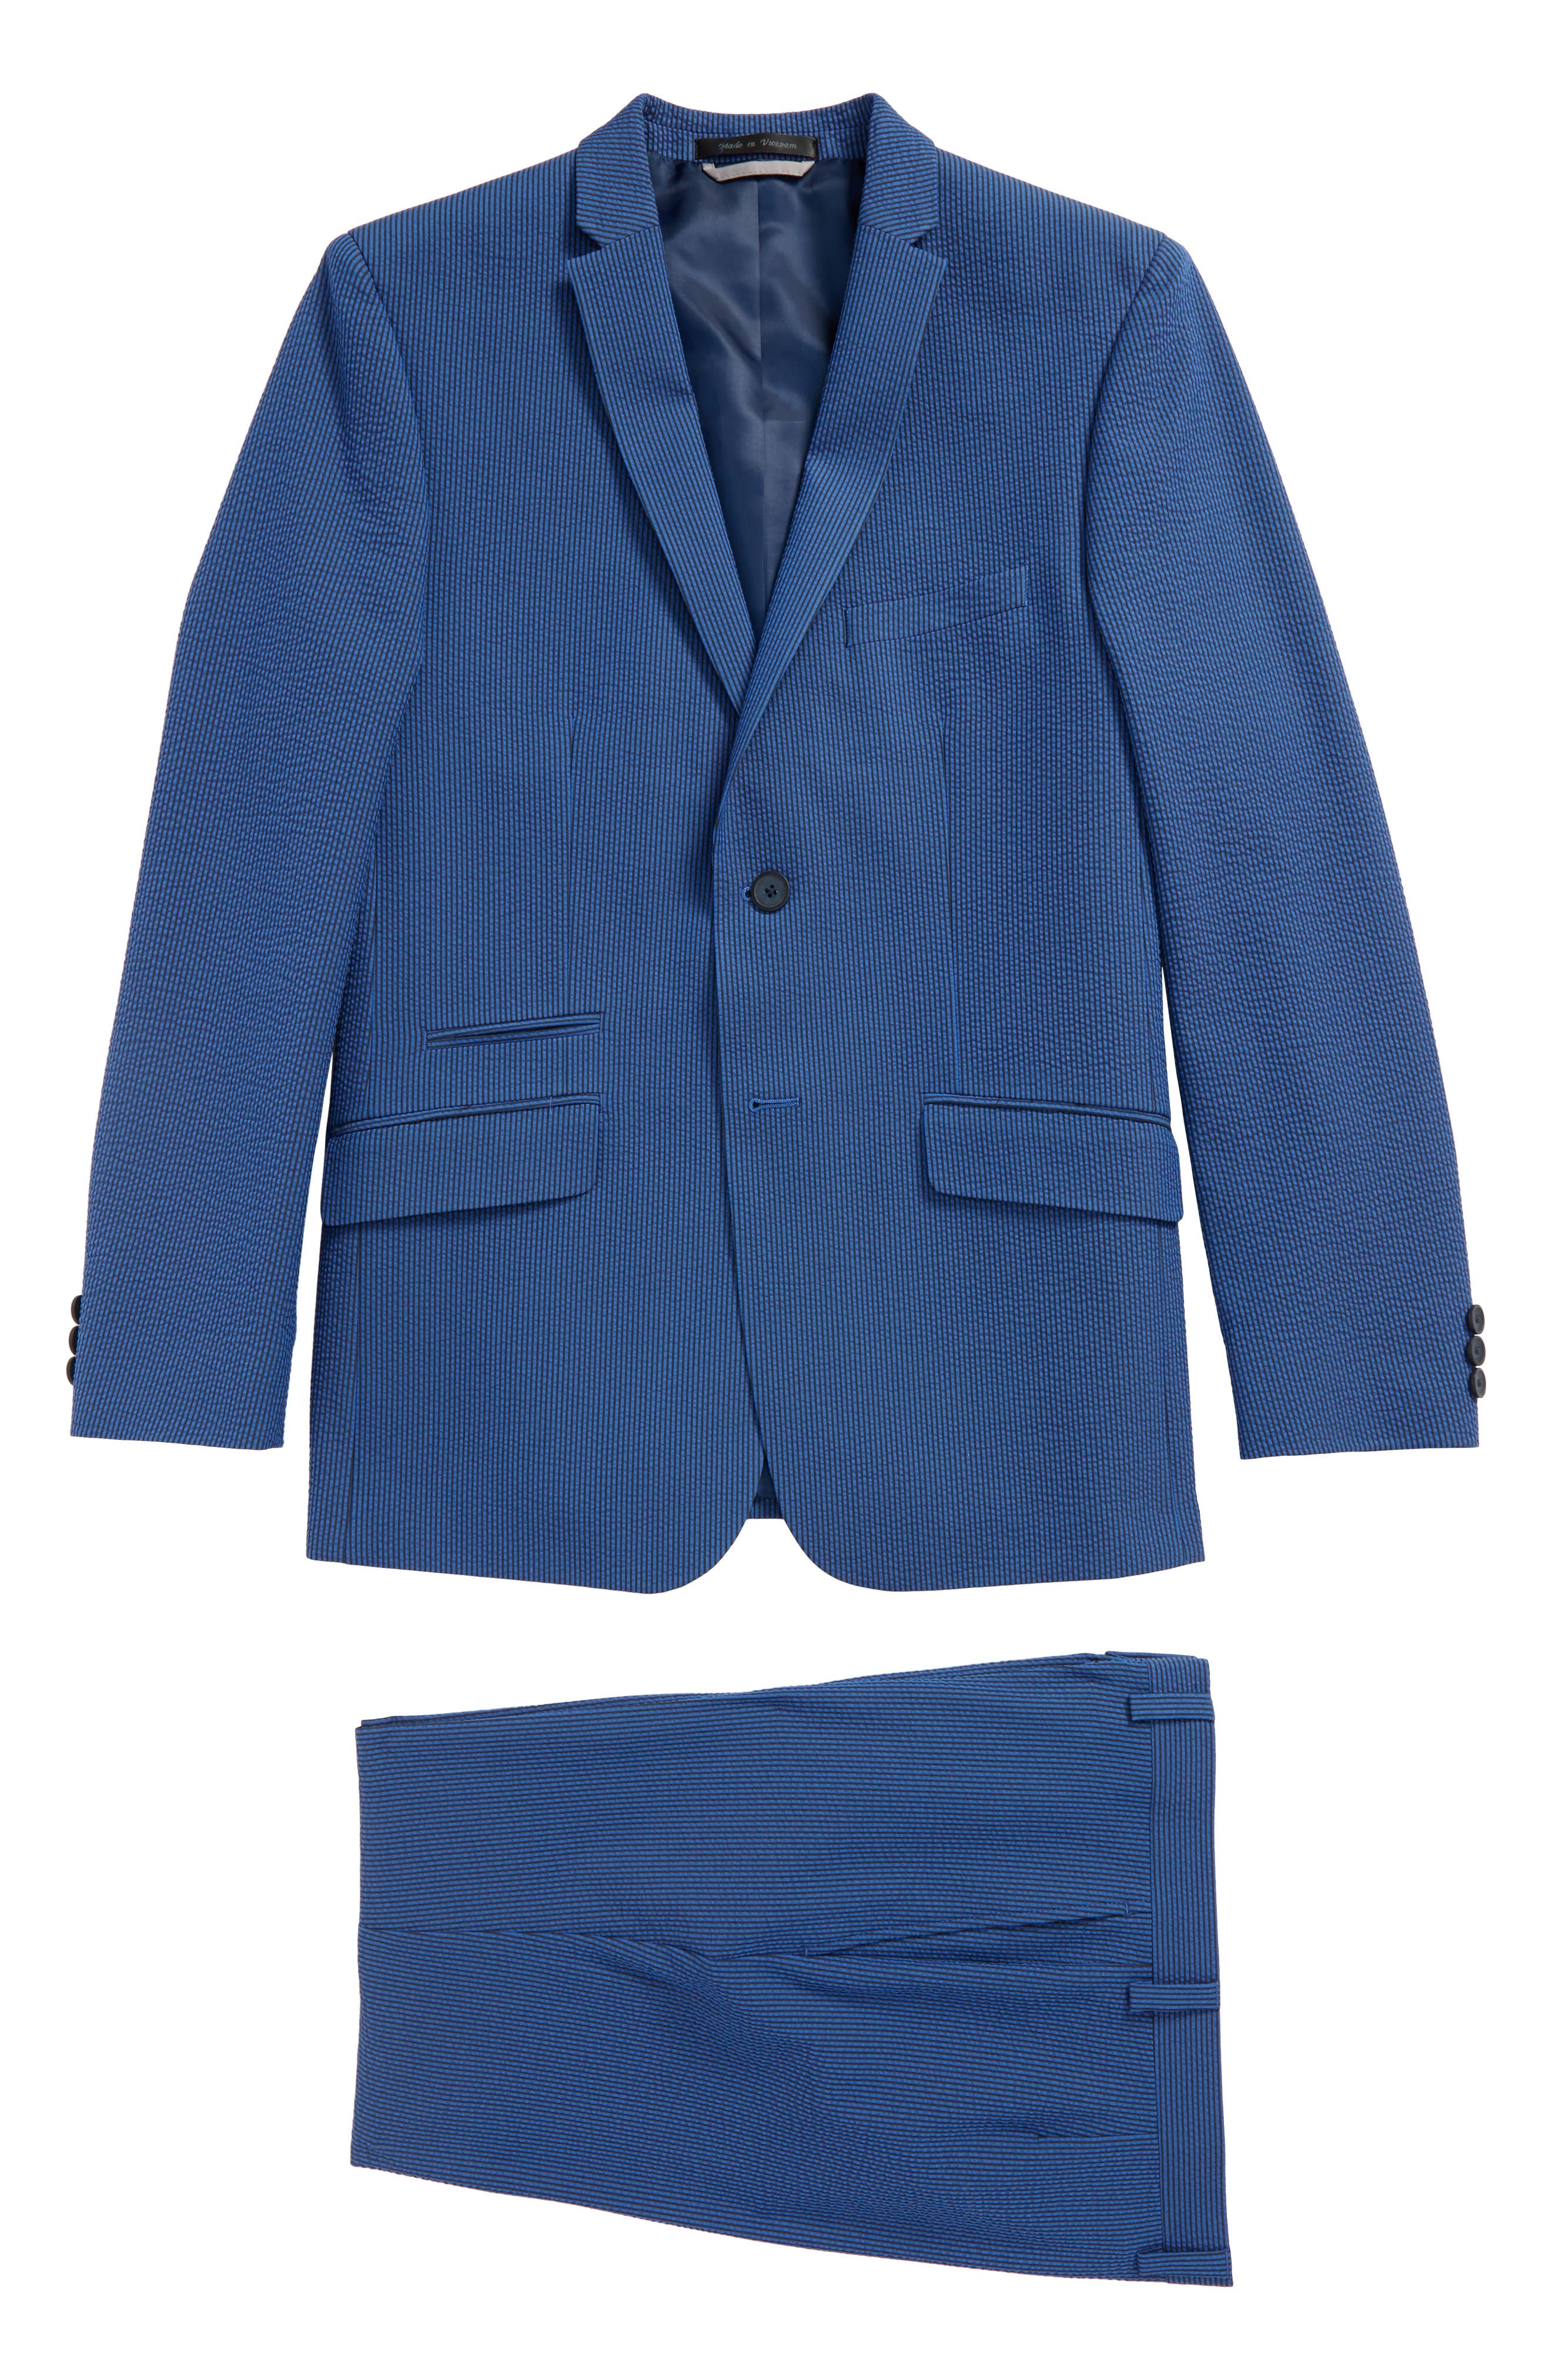 Skinny Fit Suit,                         Main,                         color, Medium Blue